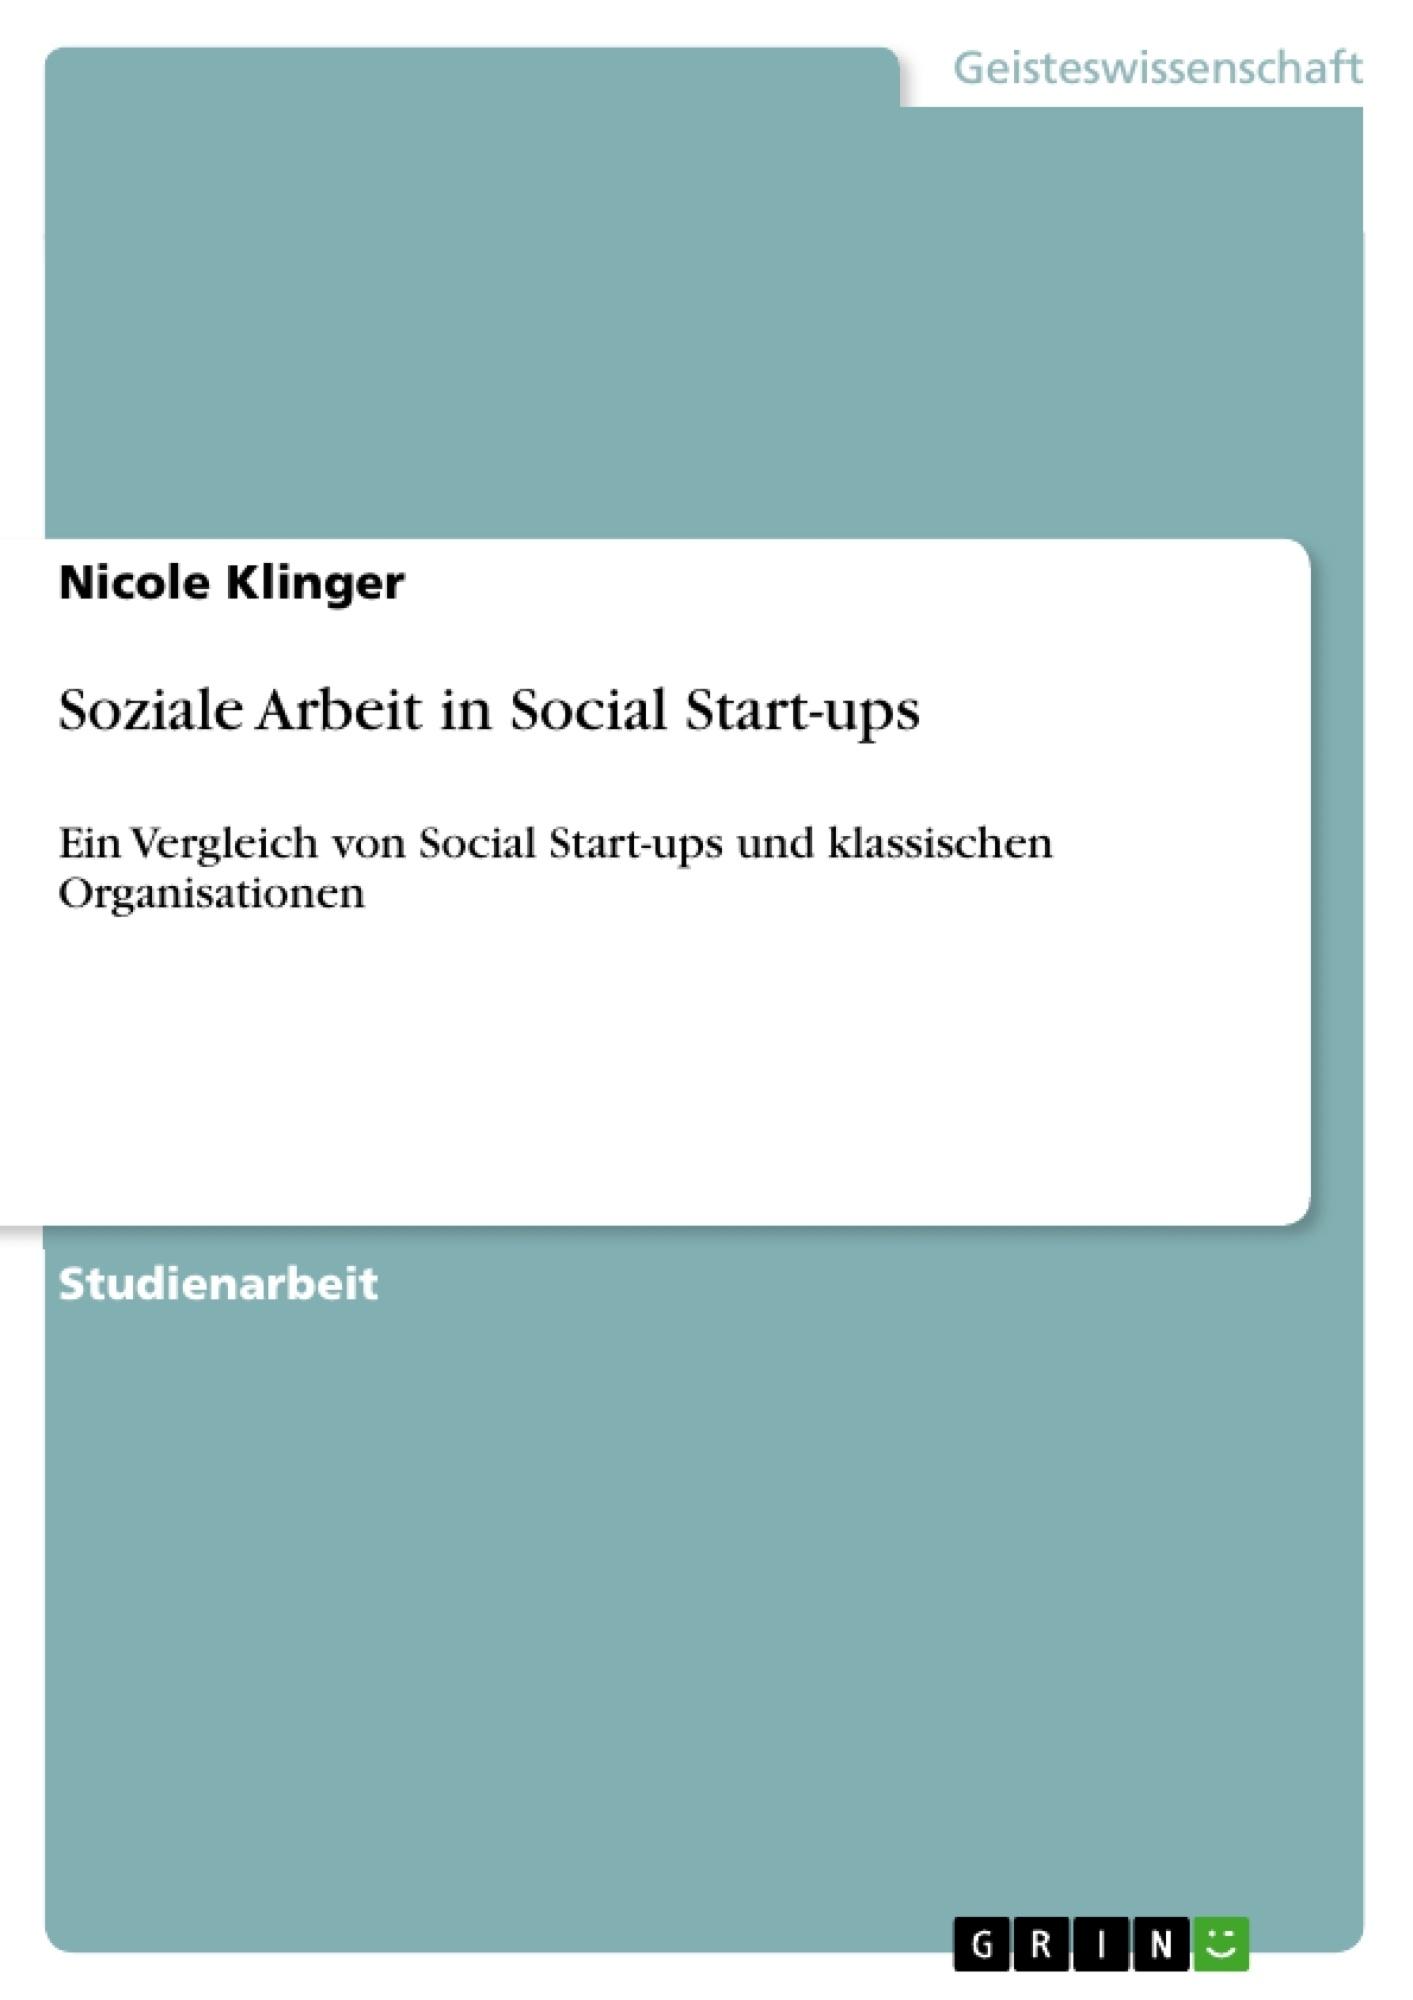 Titel: Soziale Arbeit in Social Start-ups